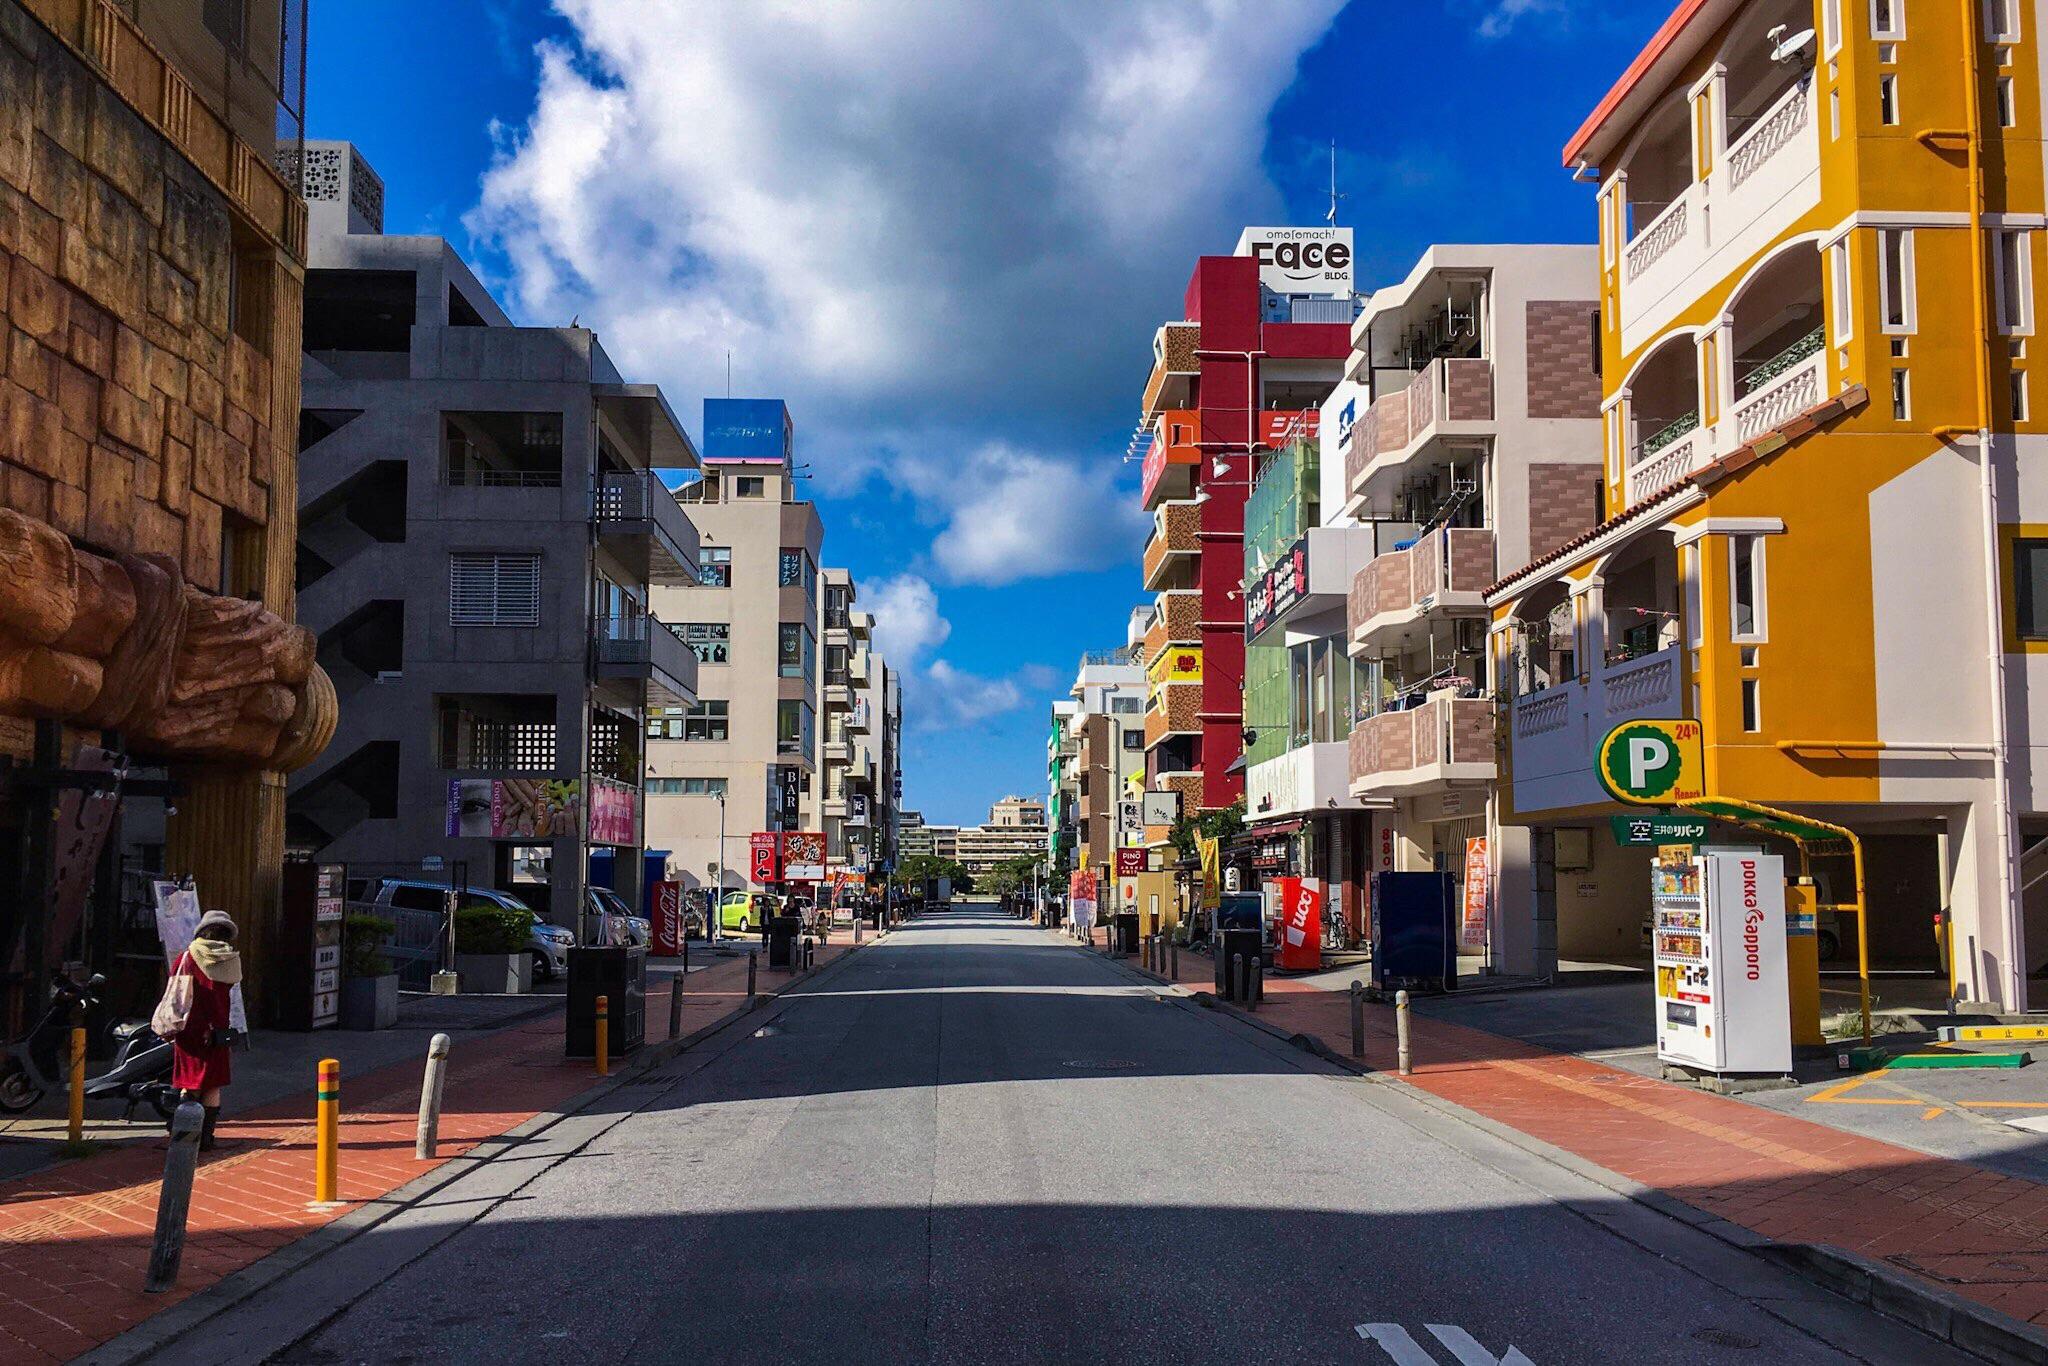 Omoromachi, Naha, Okinawa, Japan. Taken with my iPhone 6s Plus using the camera app  Pure Shot .